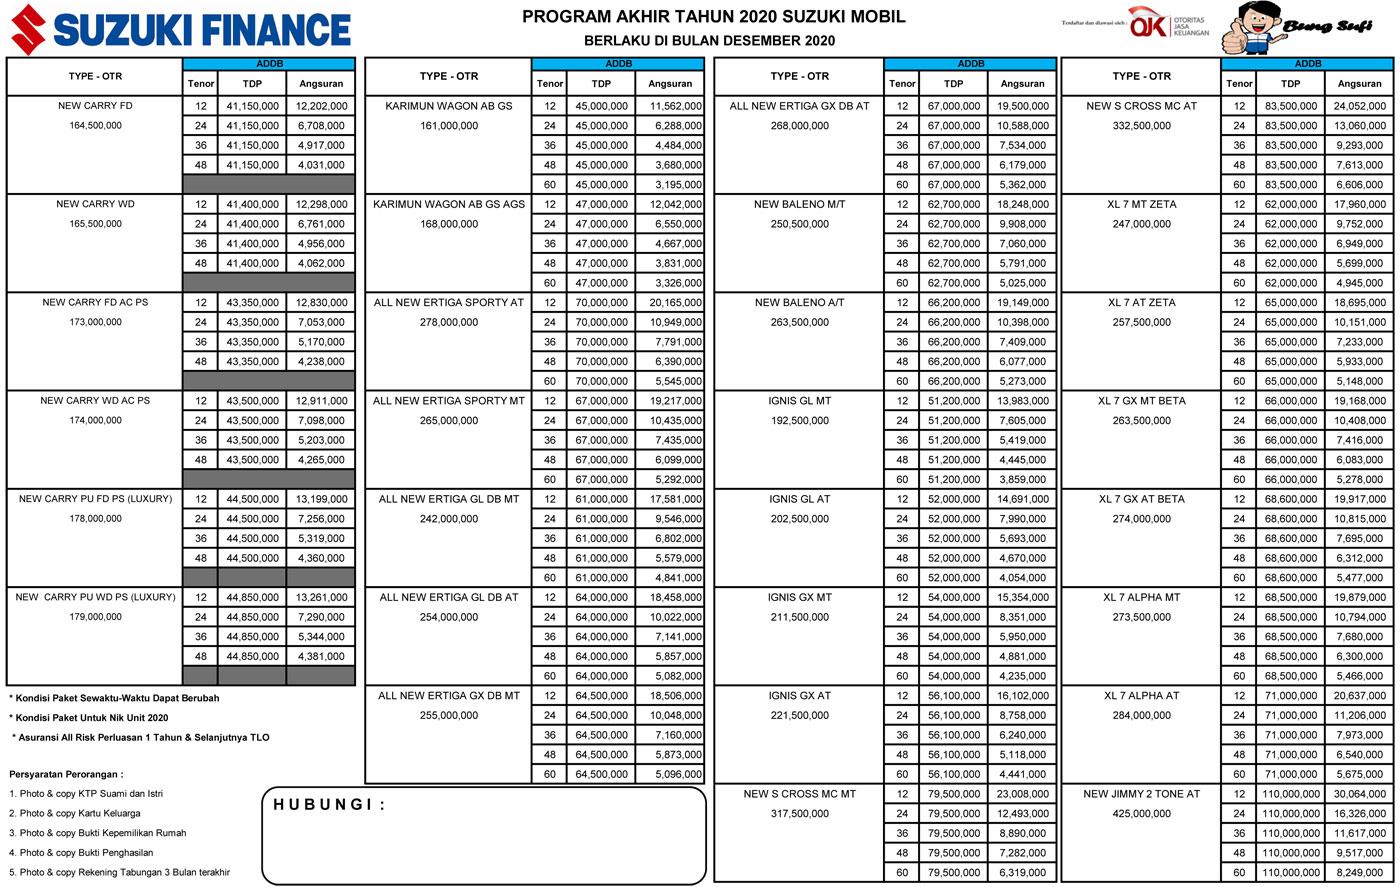 Suzuki Manado By Mellanie 0821 8722 8001 Wa Info Harga Promo 2020 Cash Credit